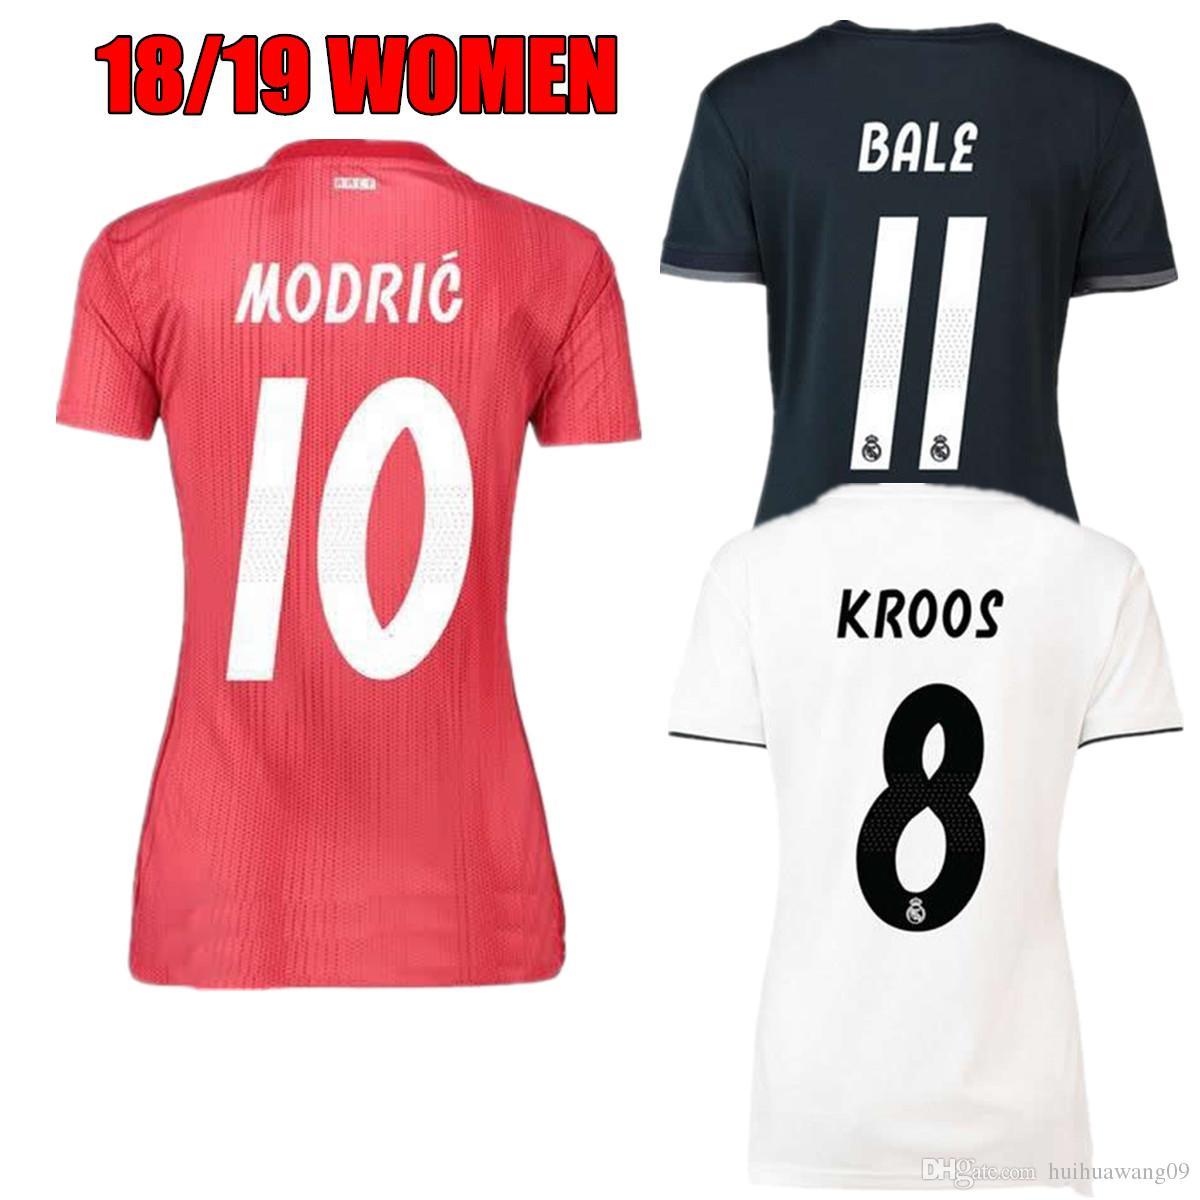 2018 2019 Mujeres Real Madrid Red Tercera Camiseta De Fútbol Asensio SERGIO  MODRIC RAMOS MARCELO BALE ISCO Camiseta KROOS 18 19 Camisetas De Fútbol De  Local ... 352d92e544a2f